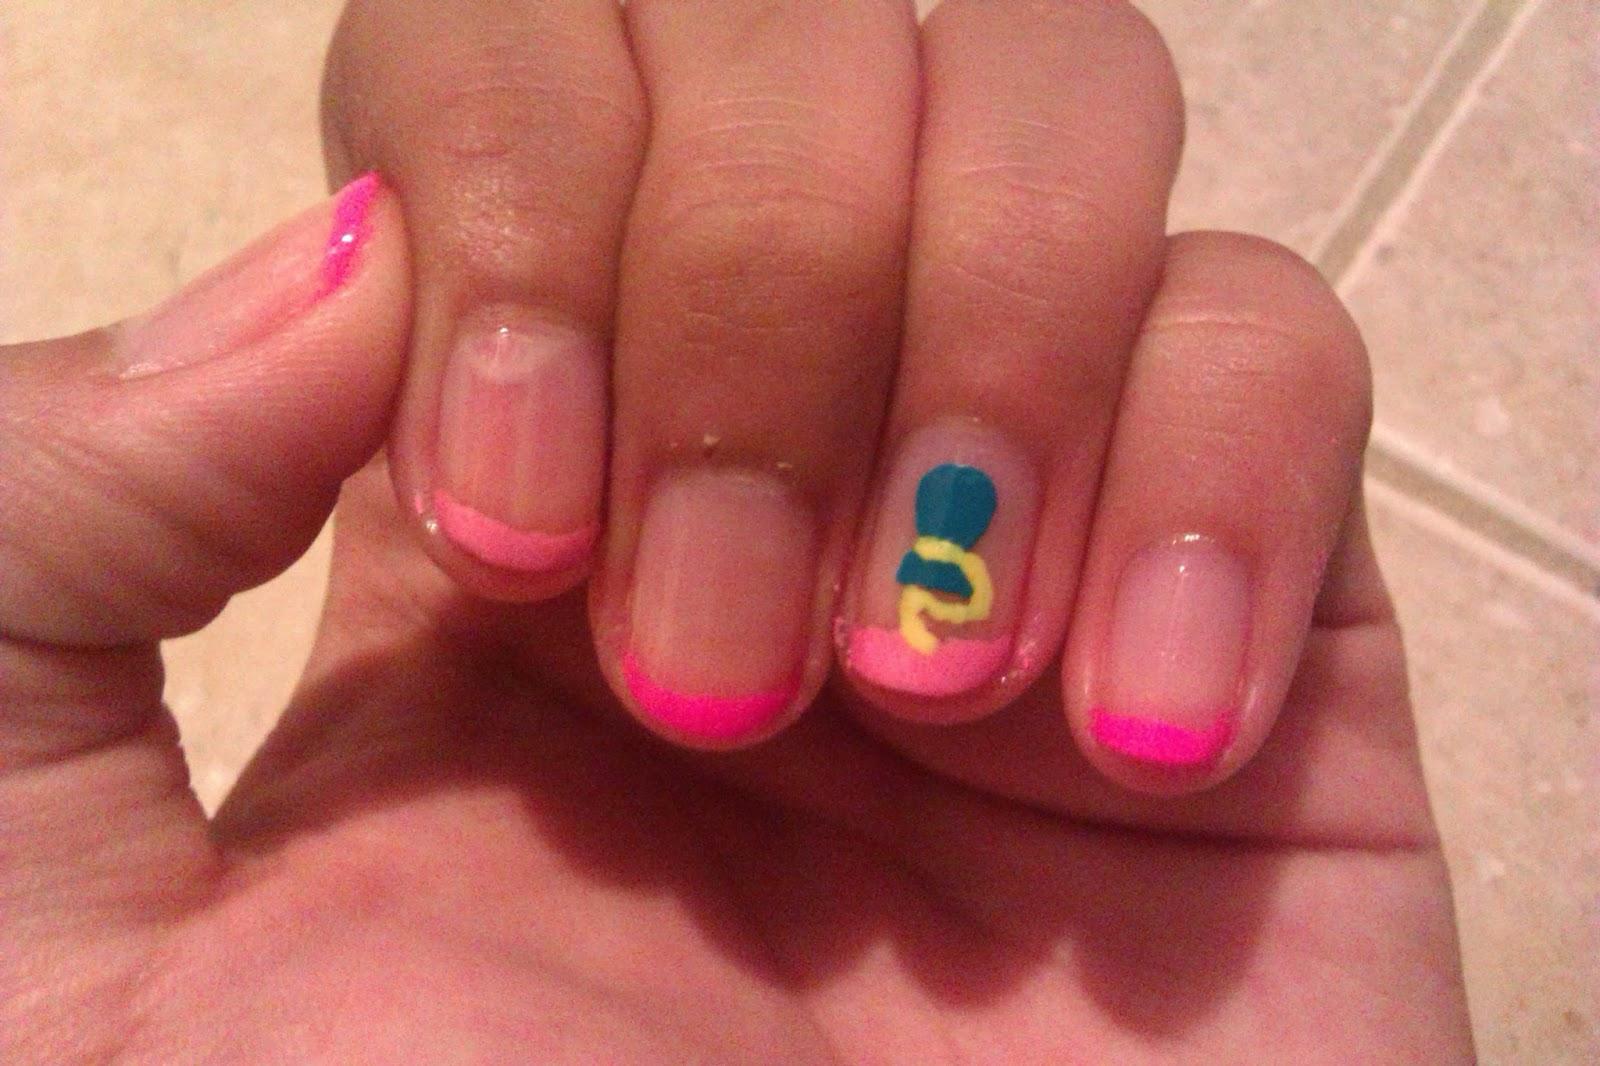 Nerd Girls Nail Art: Pinkie Pie!